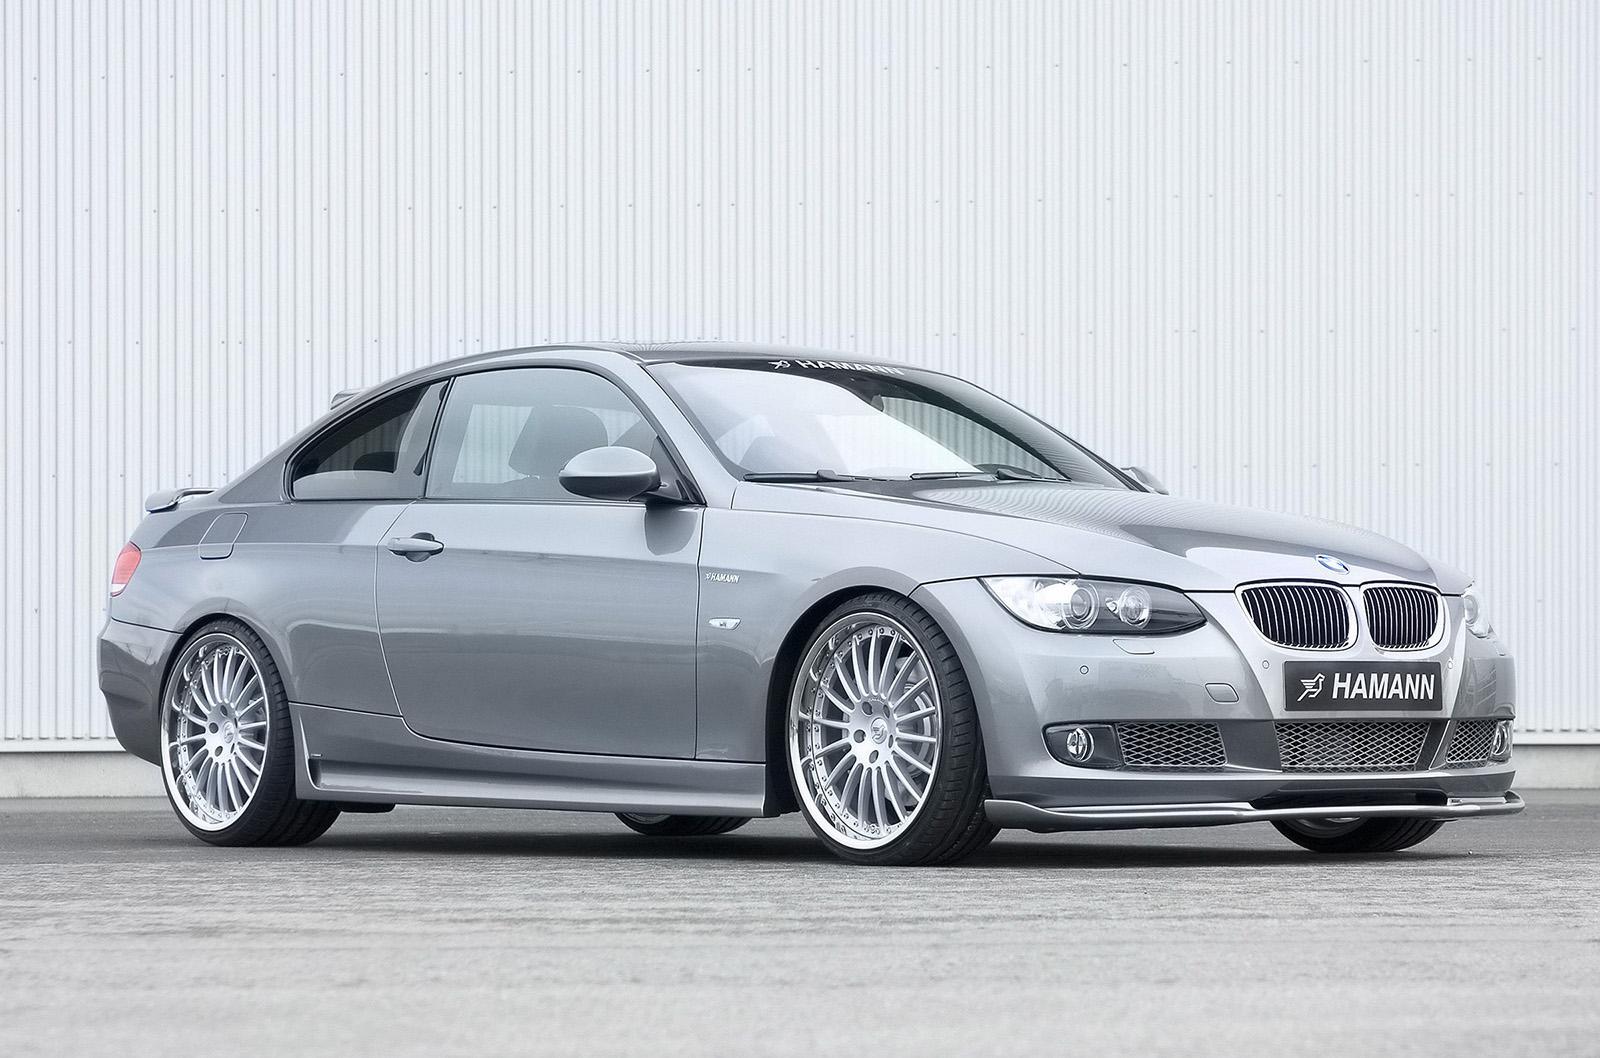 Hamann BMW 3 Series Coupe photo #1